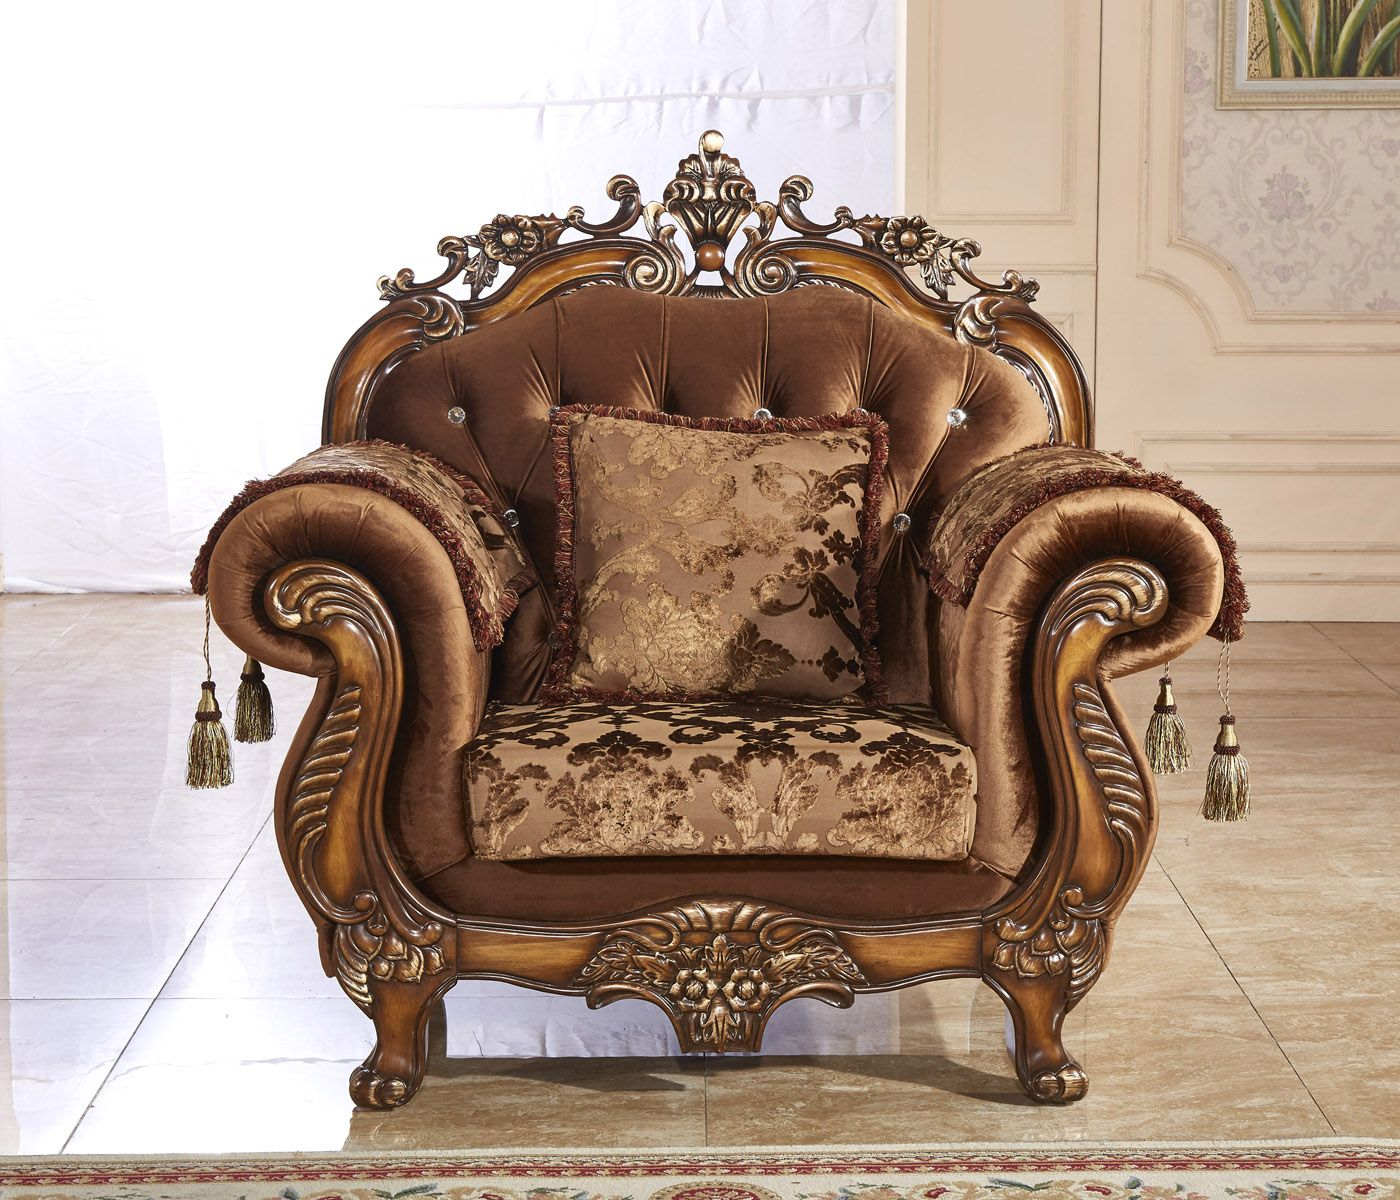 Meridian Napoli Chair in Cherry 692C Meridian furniture